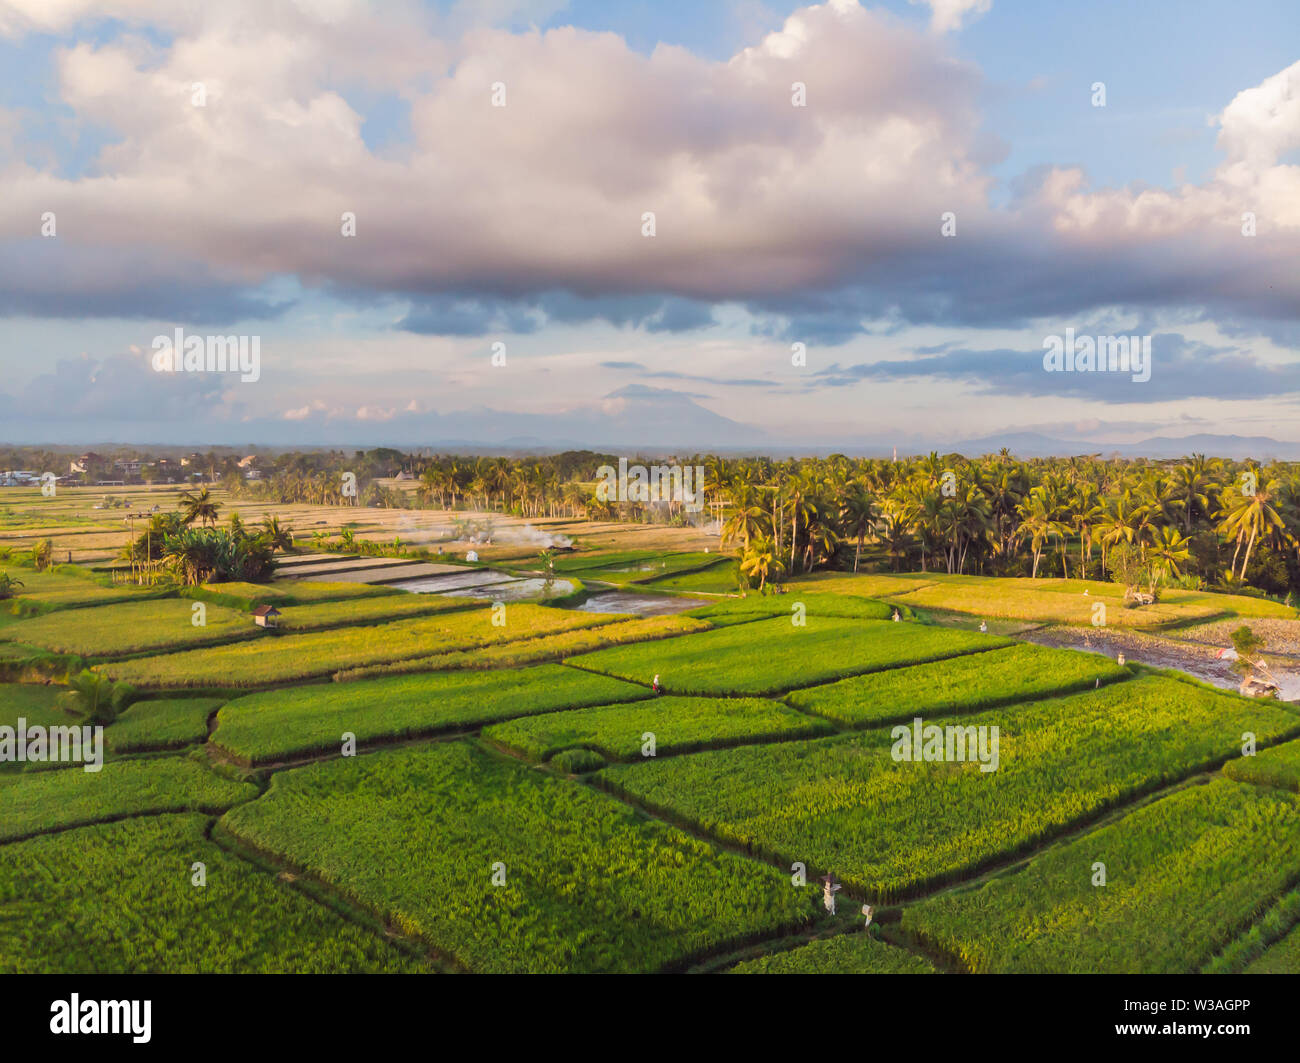 Rice Terrace Aerial Shot. Image of beautiful terrace rice field - Stock Image